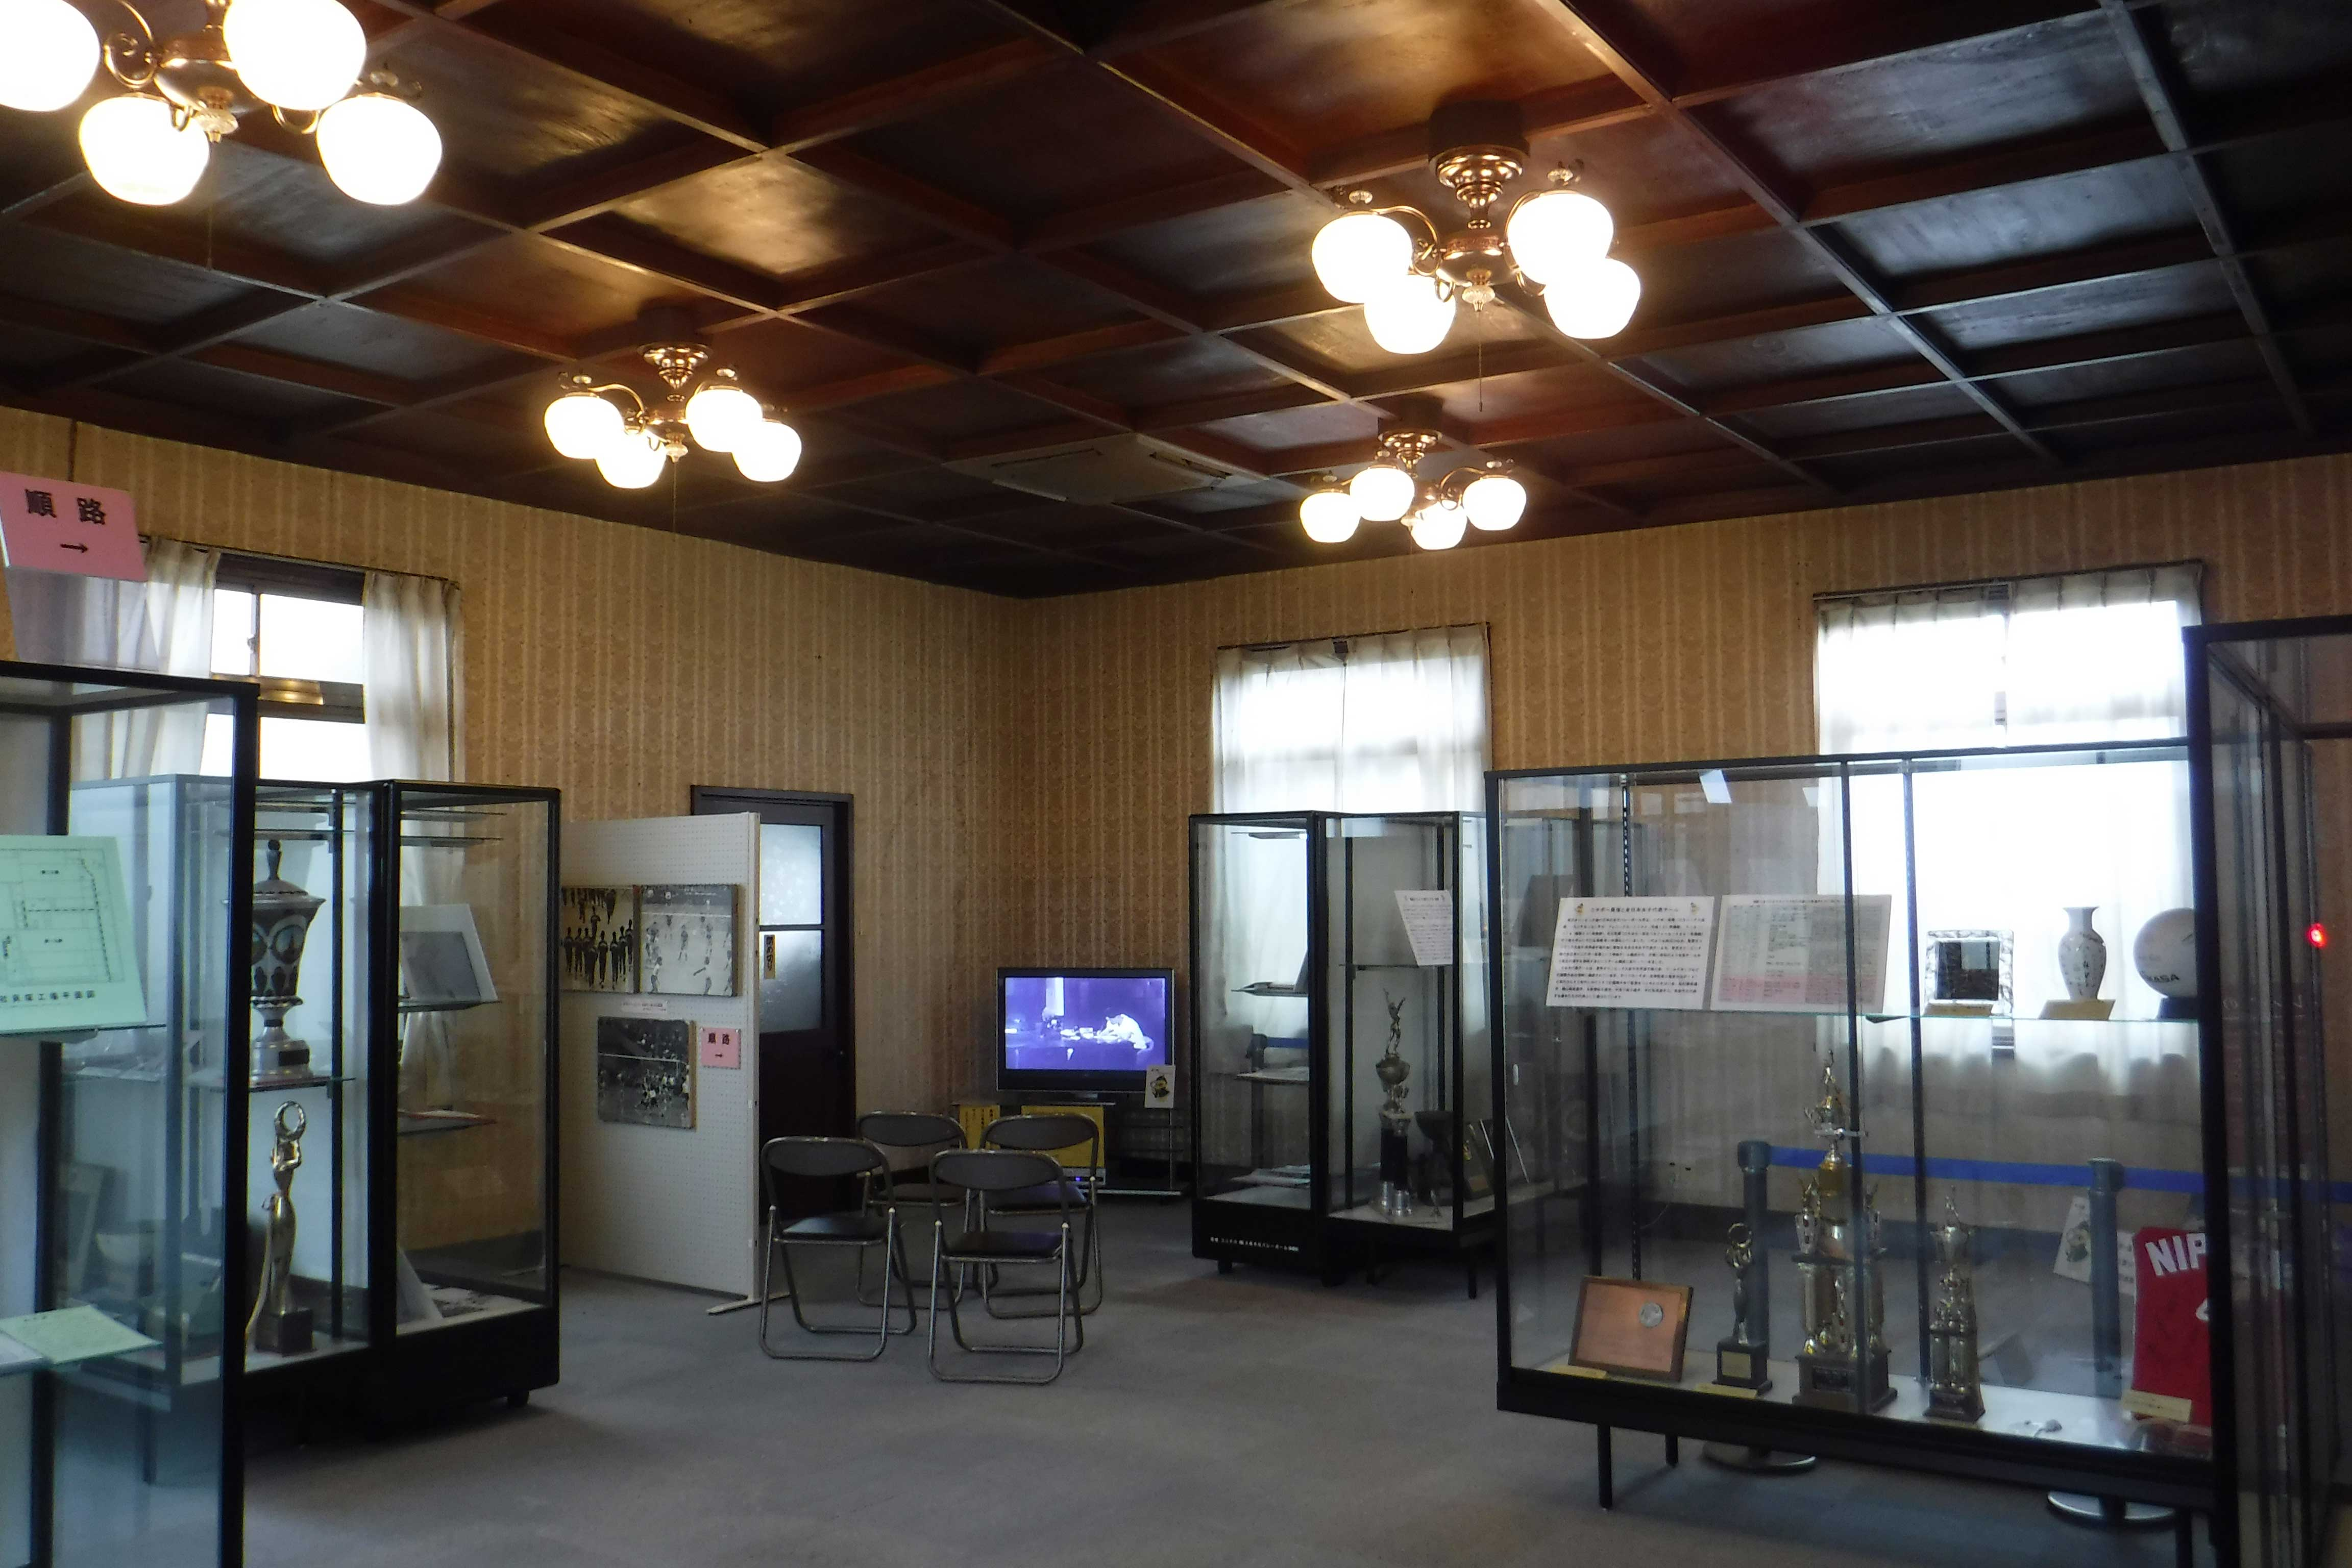 <p>展示室B</p>ニチボー貝塚女子バレーボールチーム(ニックネーム「東洋の魔女」)の歴史を展示